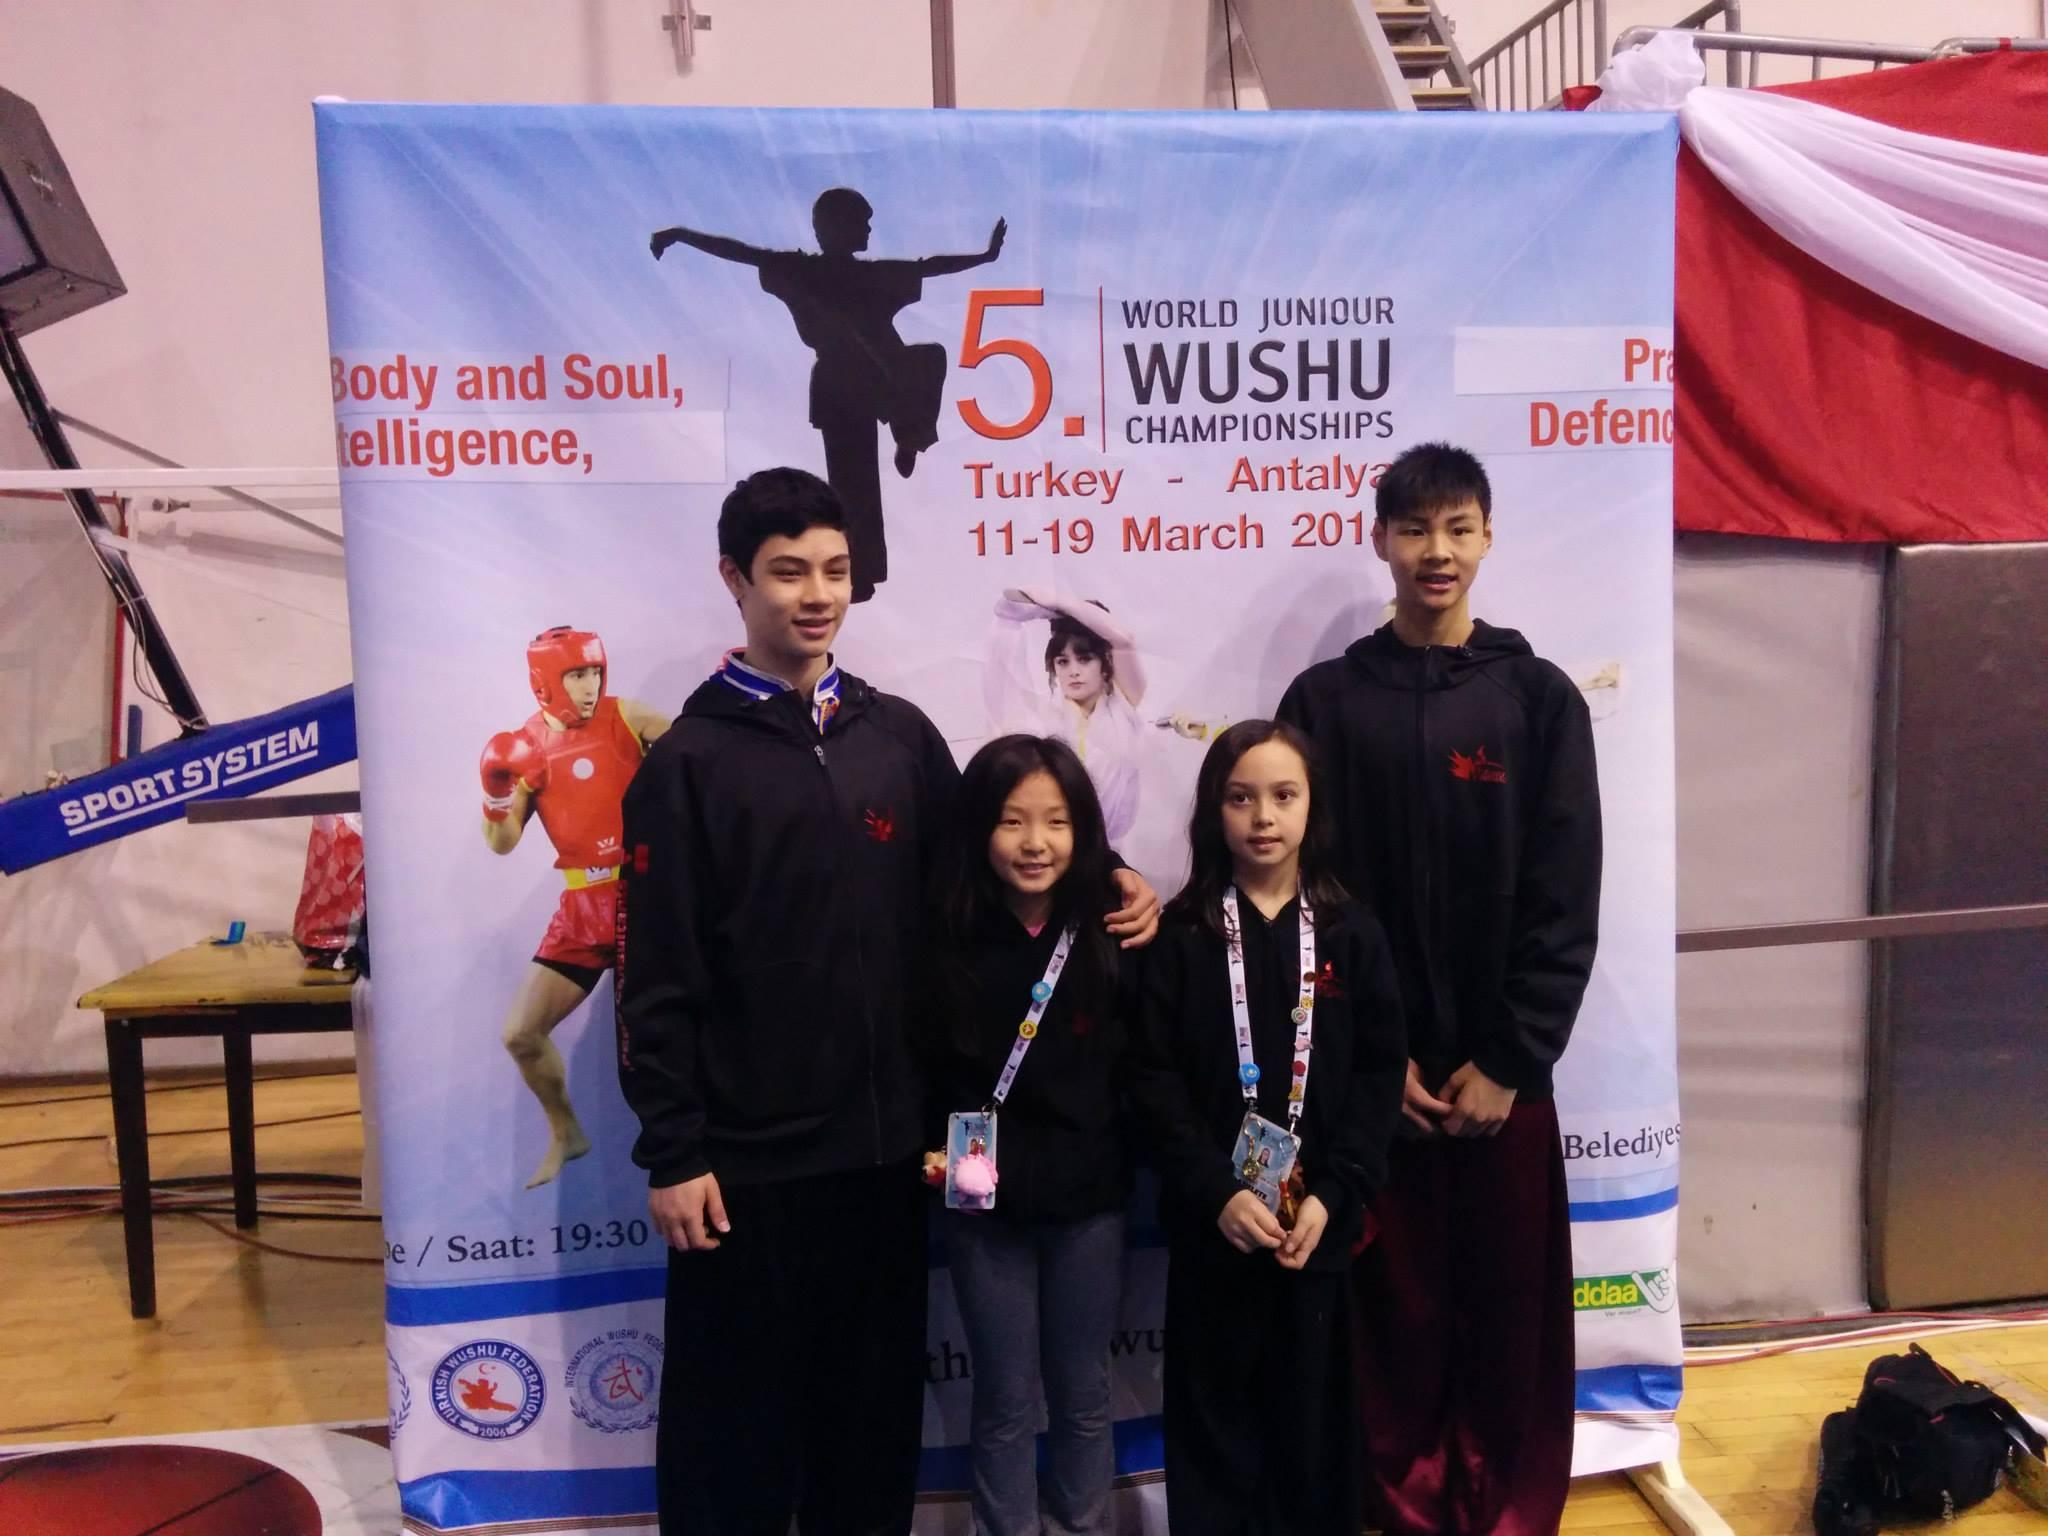 Wayland_Li_Wushu_World_Junior_Championships_2014_Turkey_3.jpg